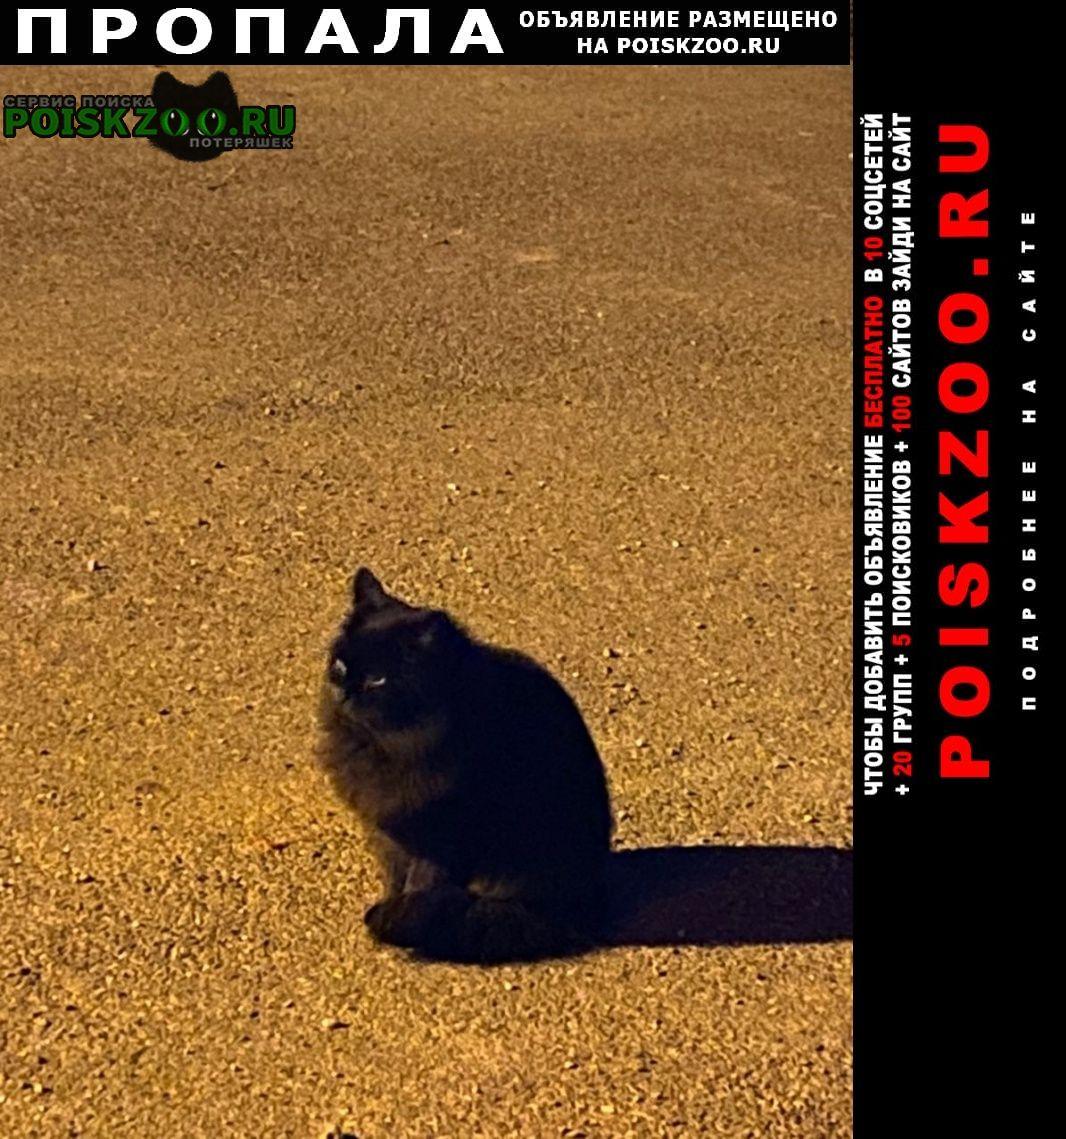 Пропала кошка Майкоп (Адыгея)